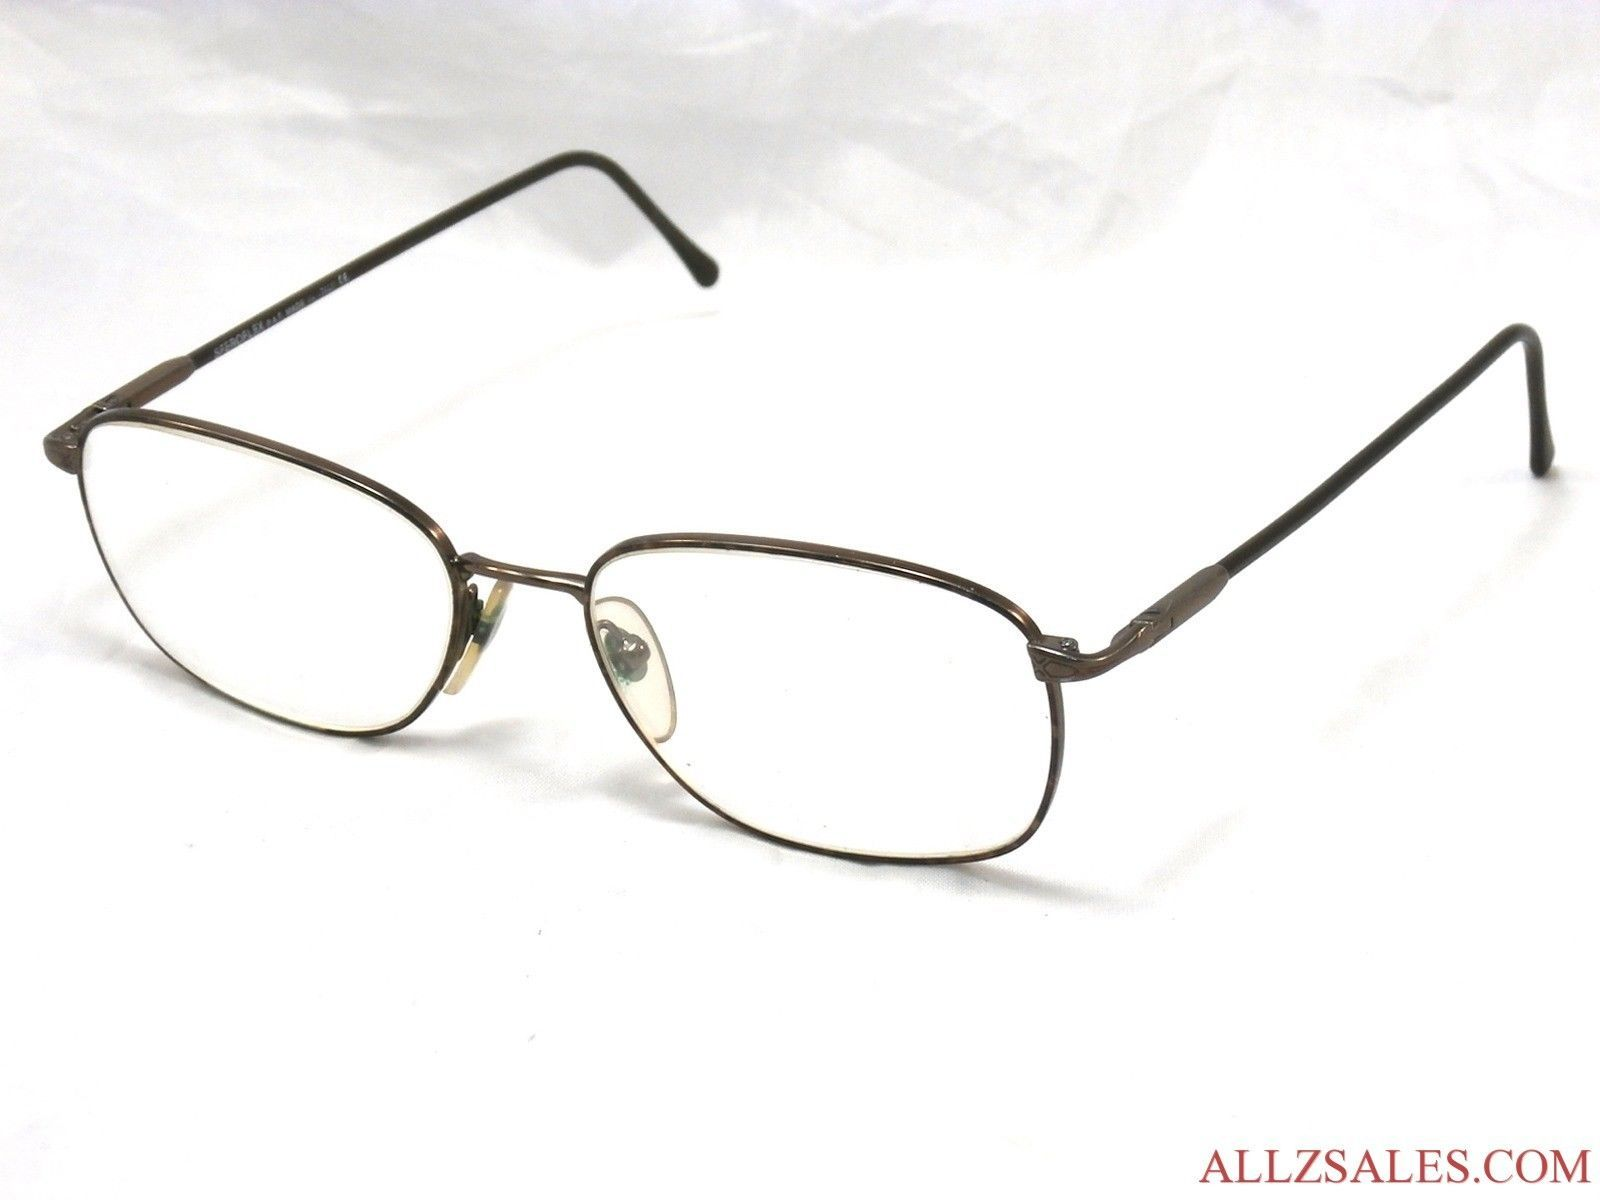 Sferoflex Eyeglass Frame: 14 listings